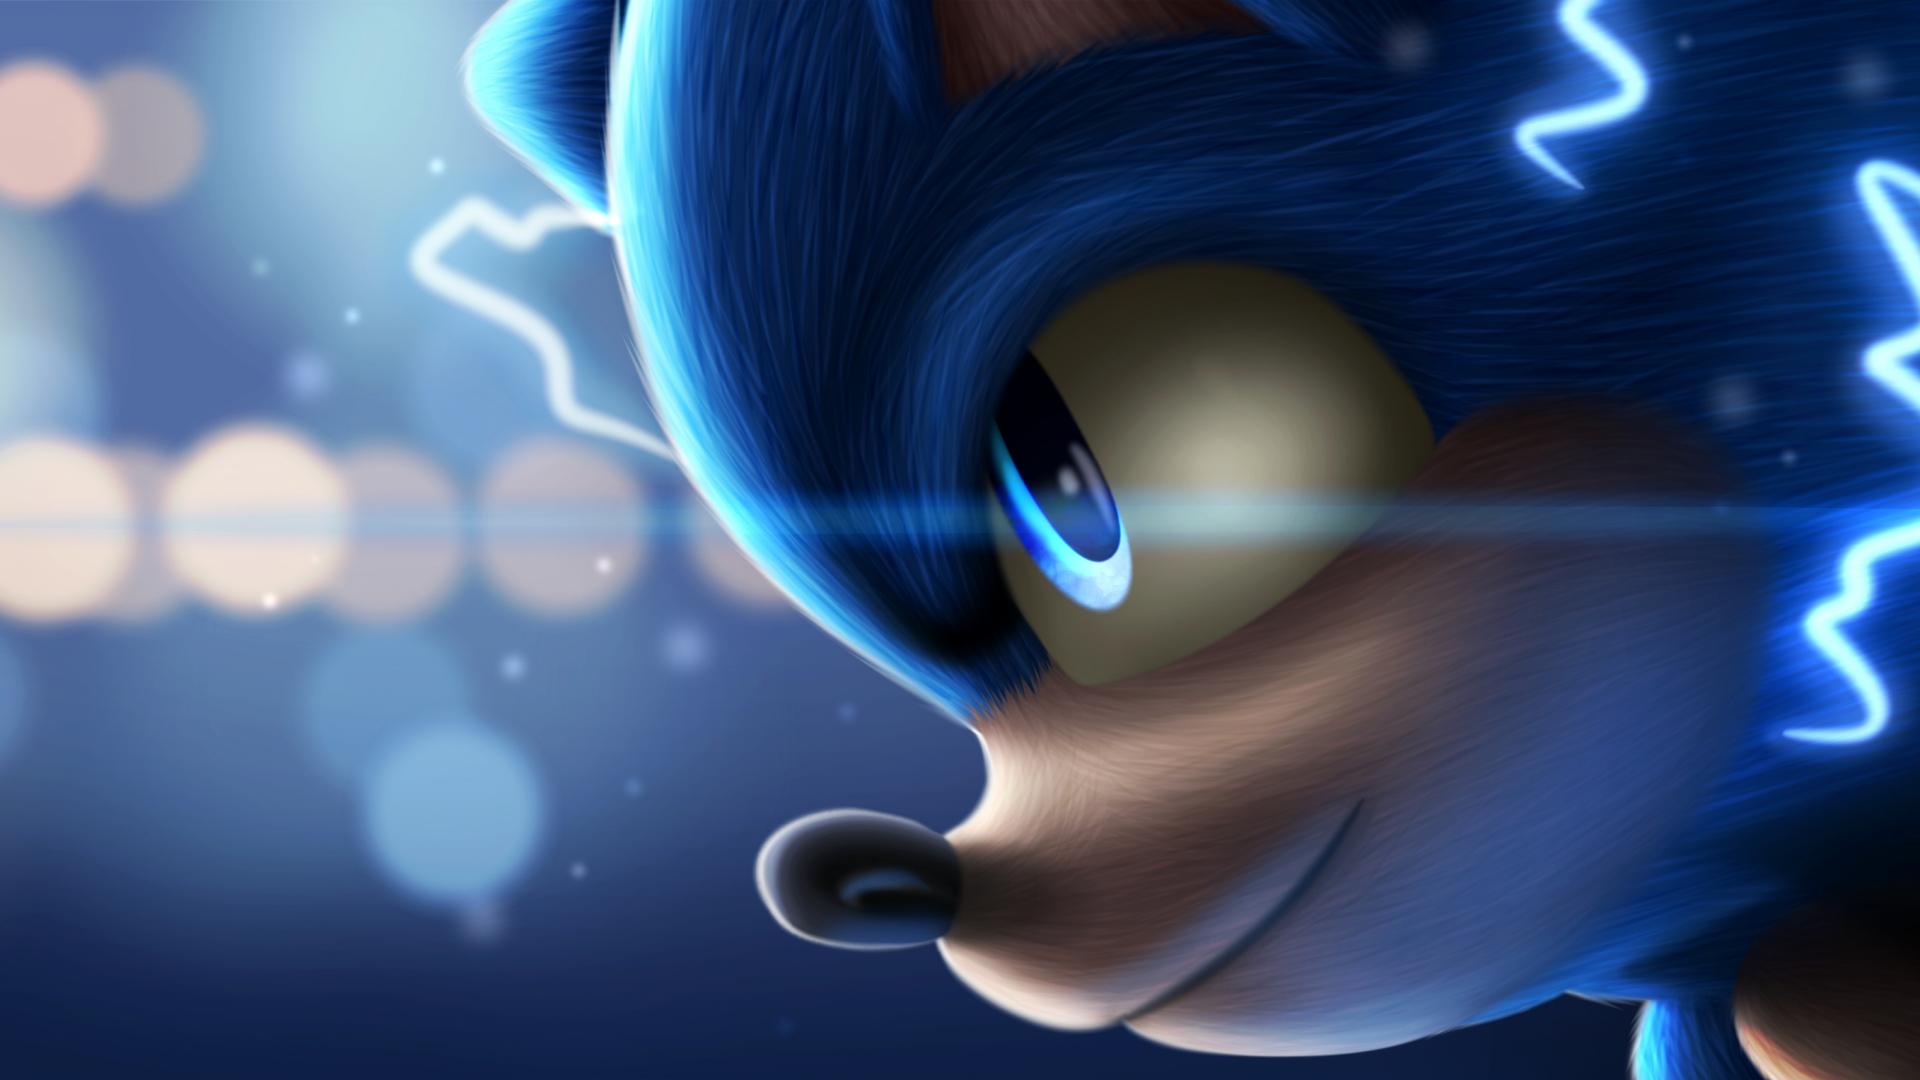 sonic the hedgehog 2020 wallpaper hd